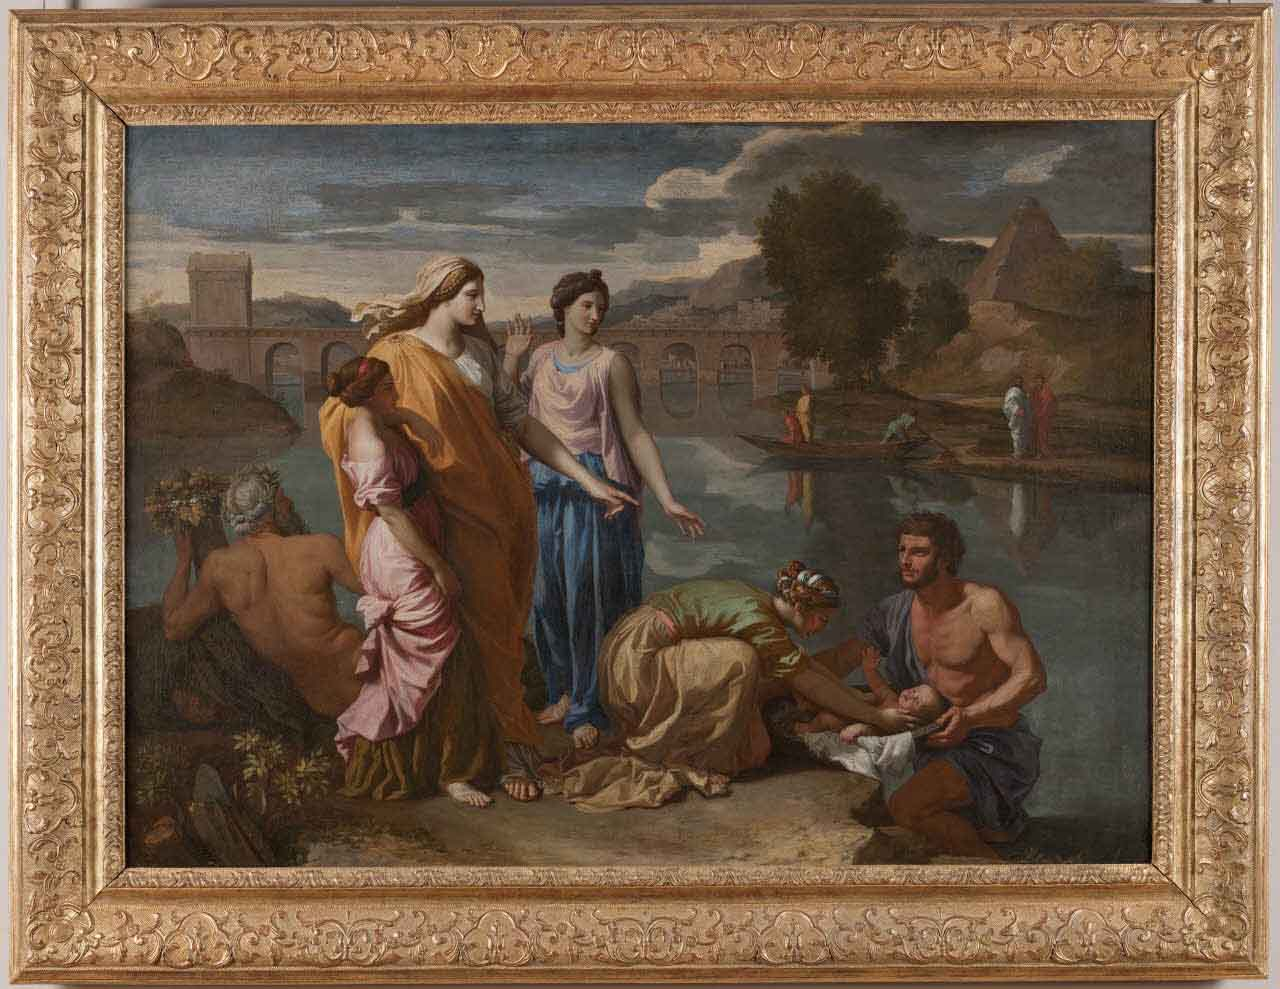 Poussin, Mosè salvato dalle acque